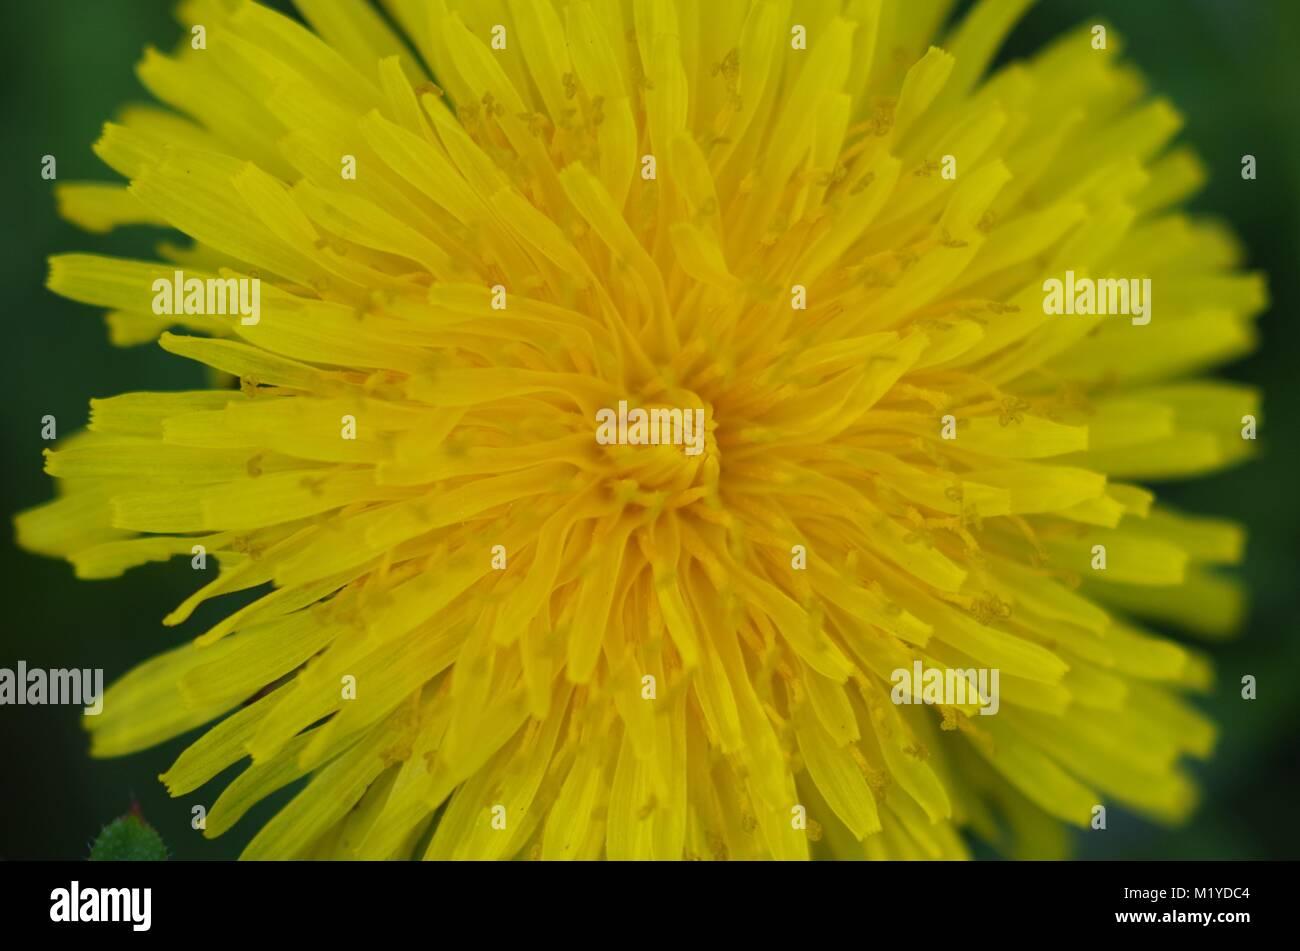 Common Dandelion Flower in Bloom. (Taraxacum officinale) Grow on a Devon Allotment. Summer, UK. - Stock Image